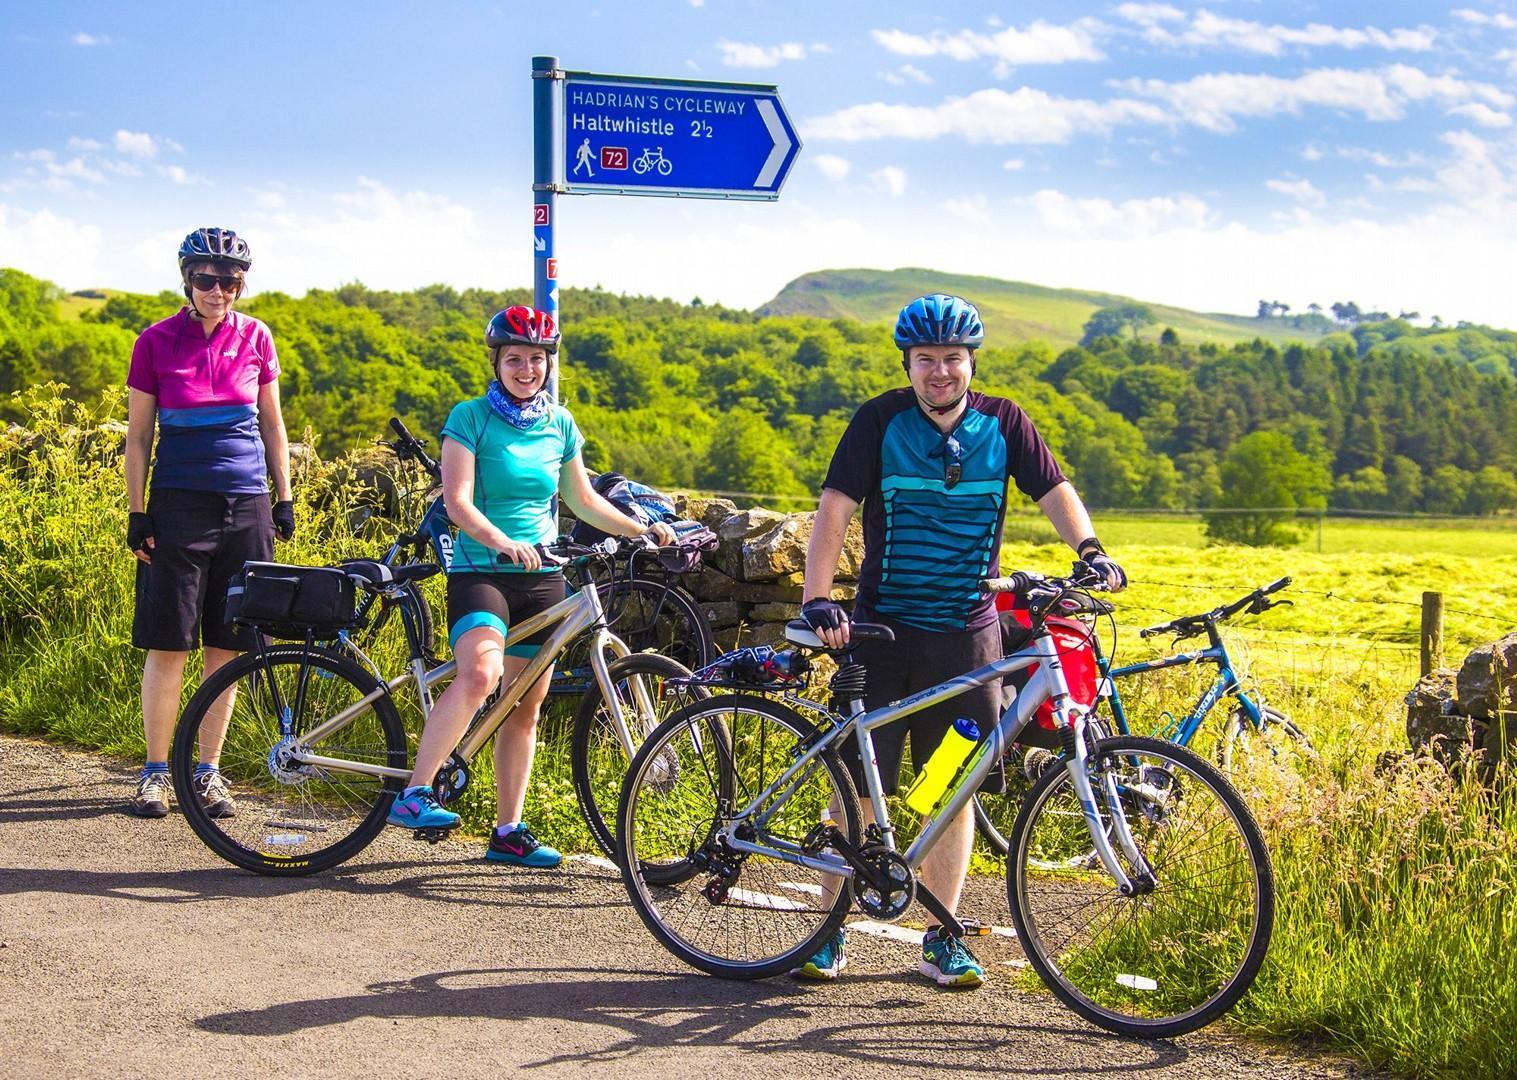 1806_0237-2.jpg - UK - Hadrian's Cycleway - 2 Days Cycling - Self-Guided Leisure Cycling Holiday - Leisure Cycling